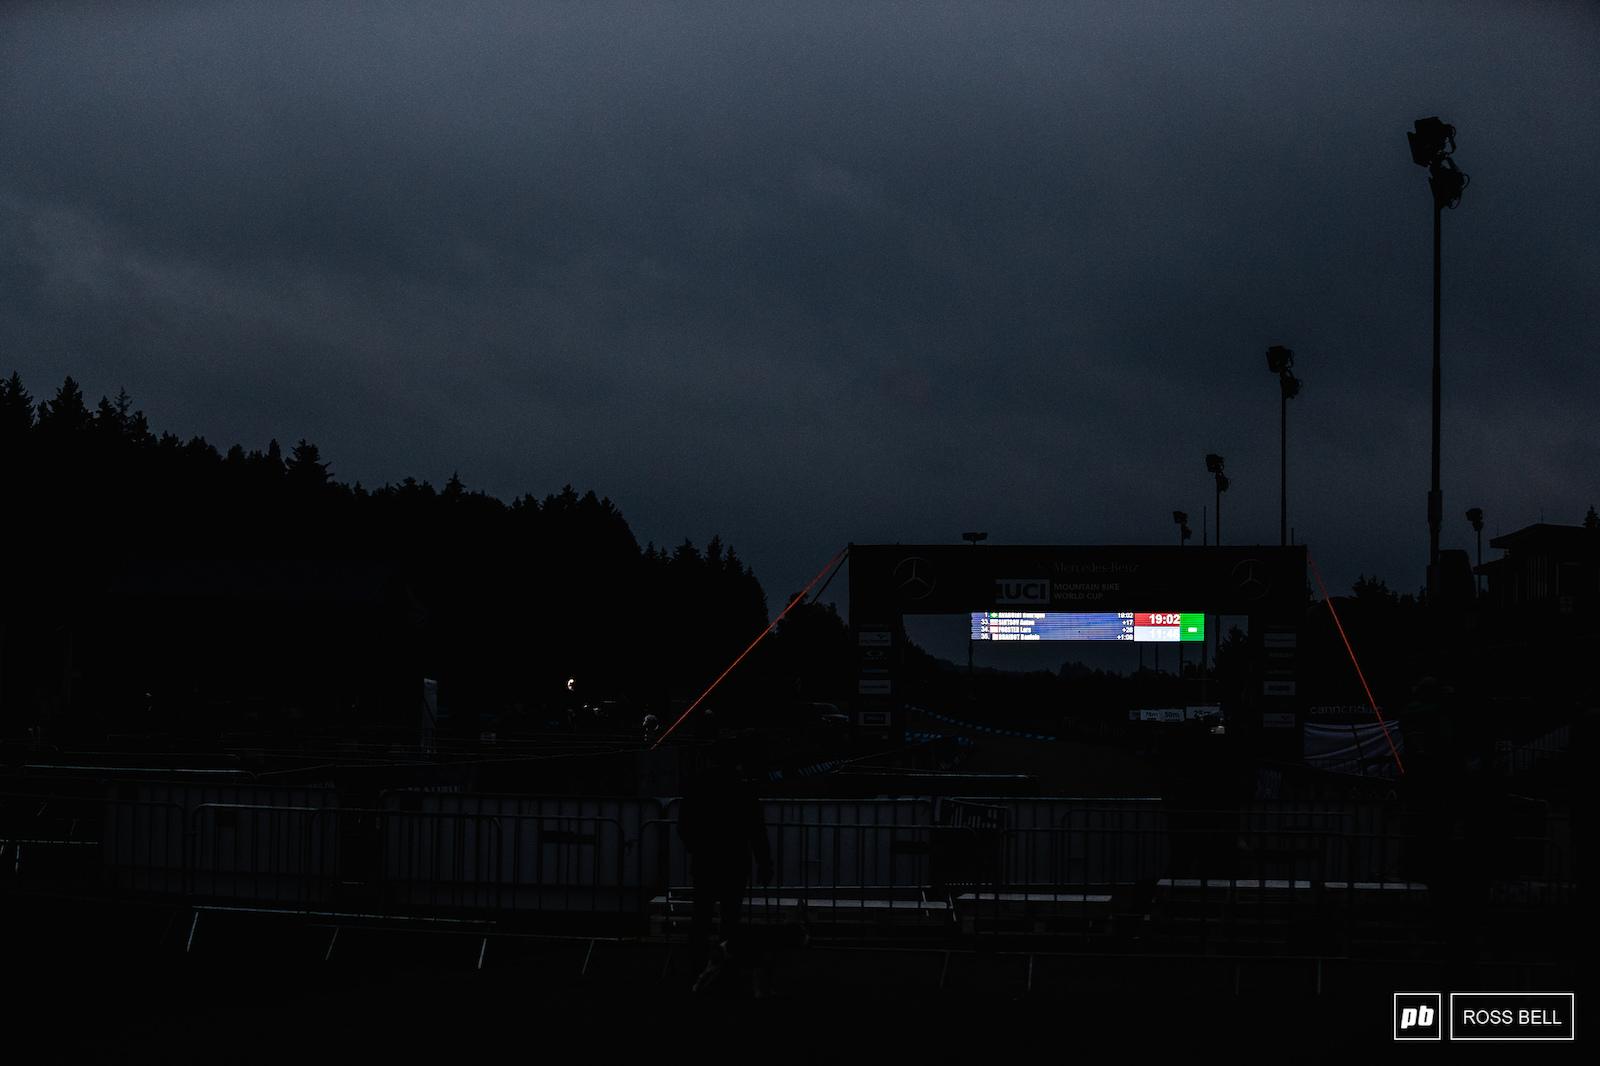 Goodnight Nove Mesto see you on Sunday.